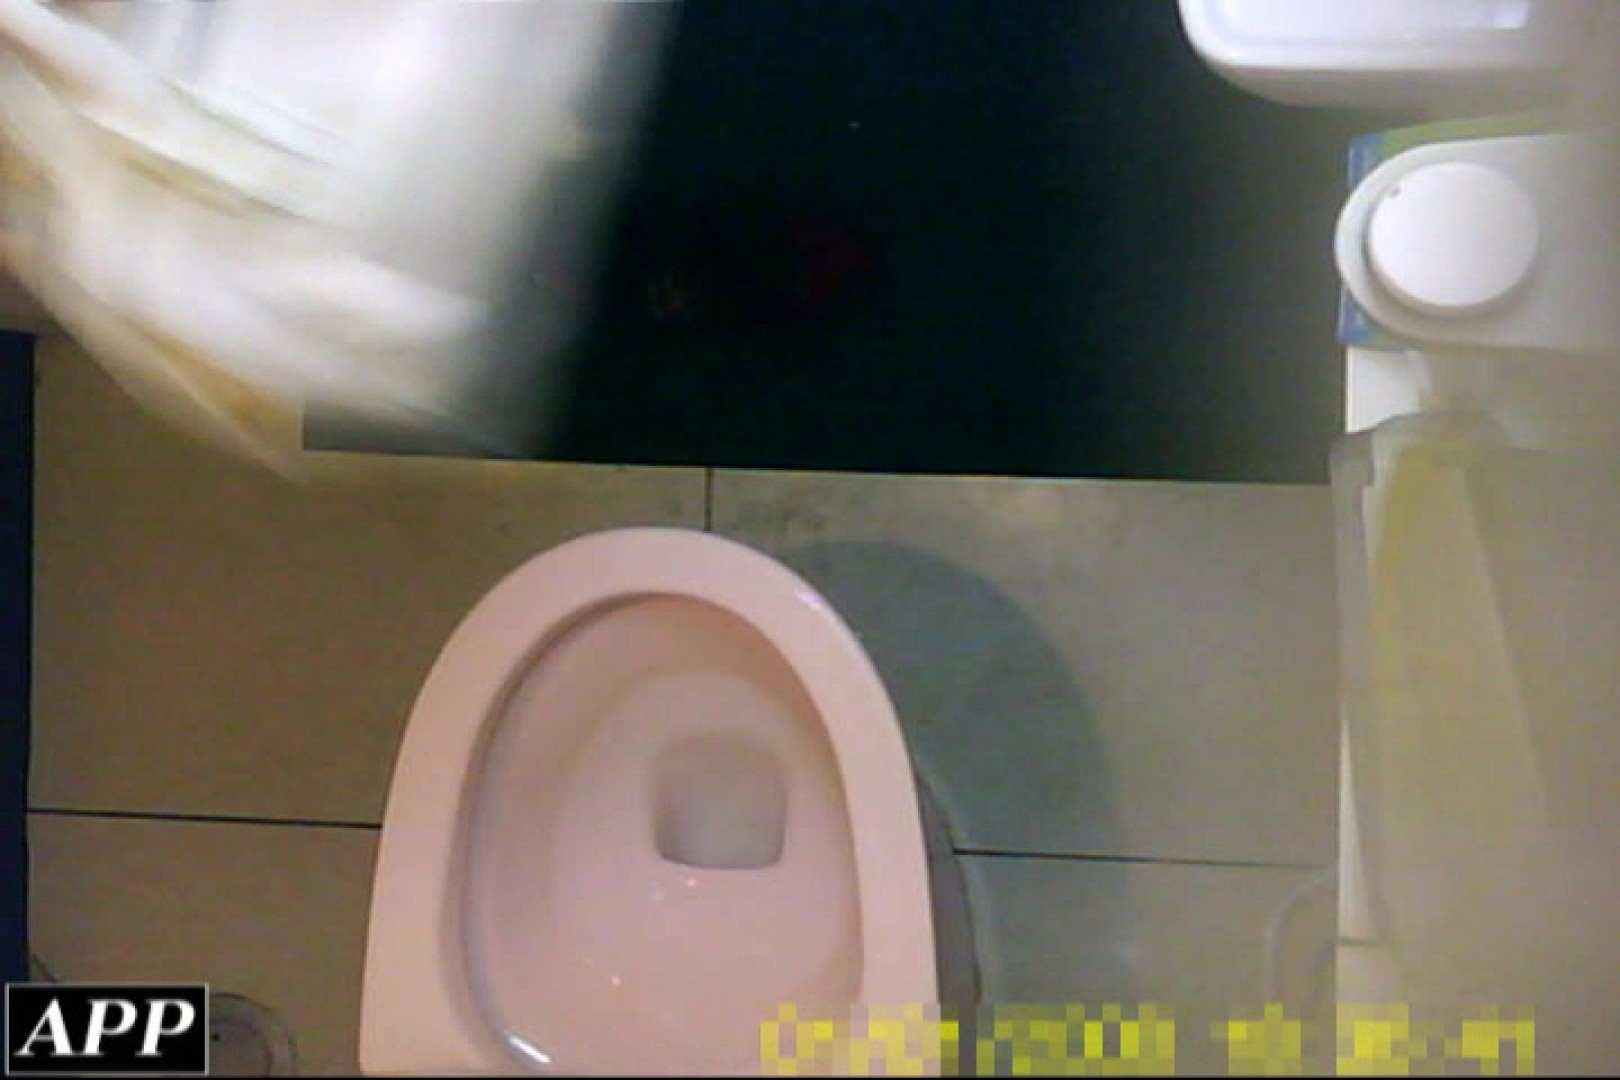 3視点洗面所 vol.053 洗面所 | OLセックス  67画像 41